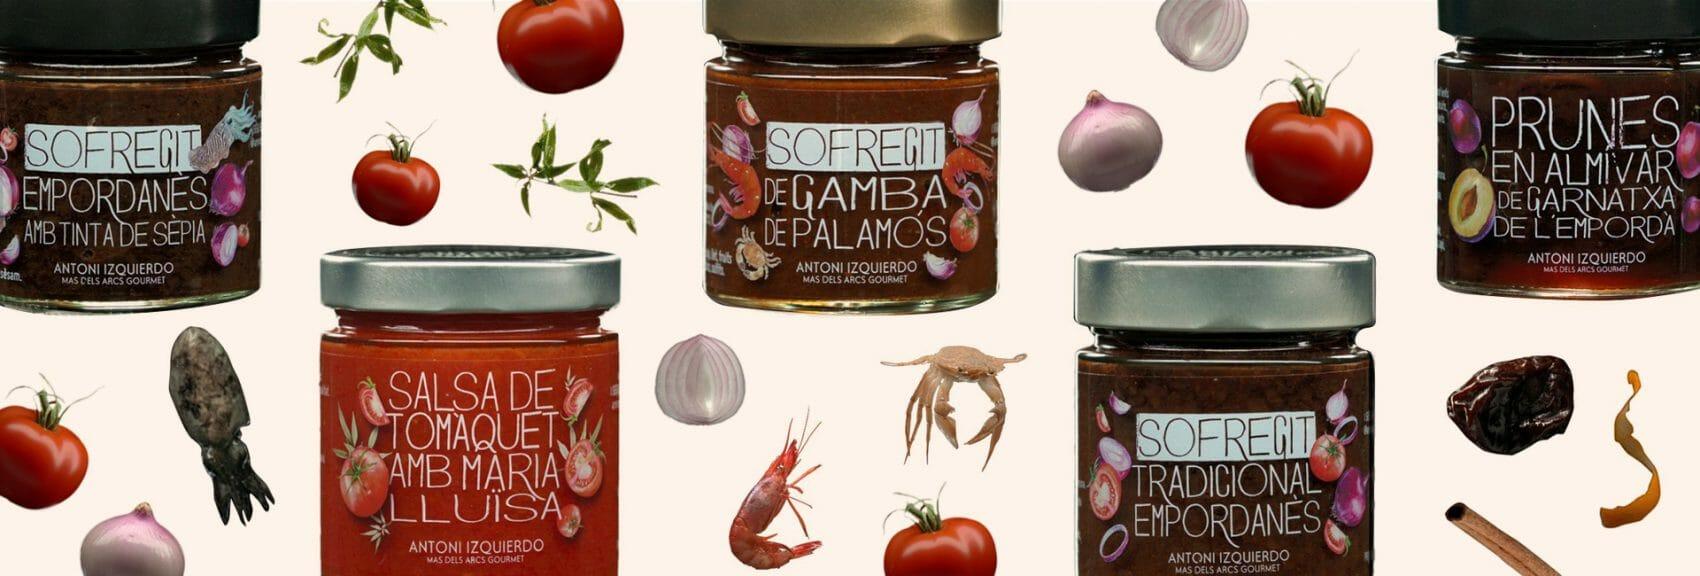 Variedad de conservas Antoni Izquierdo Gourmet